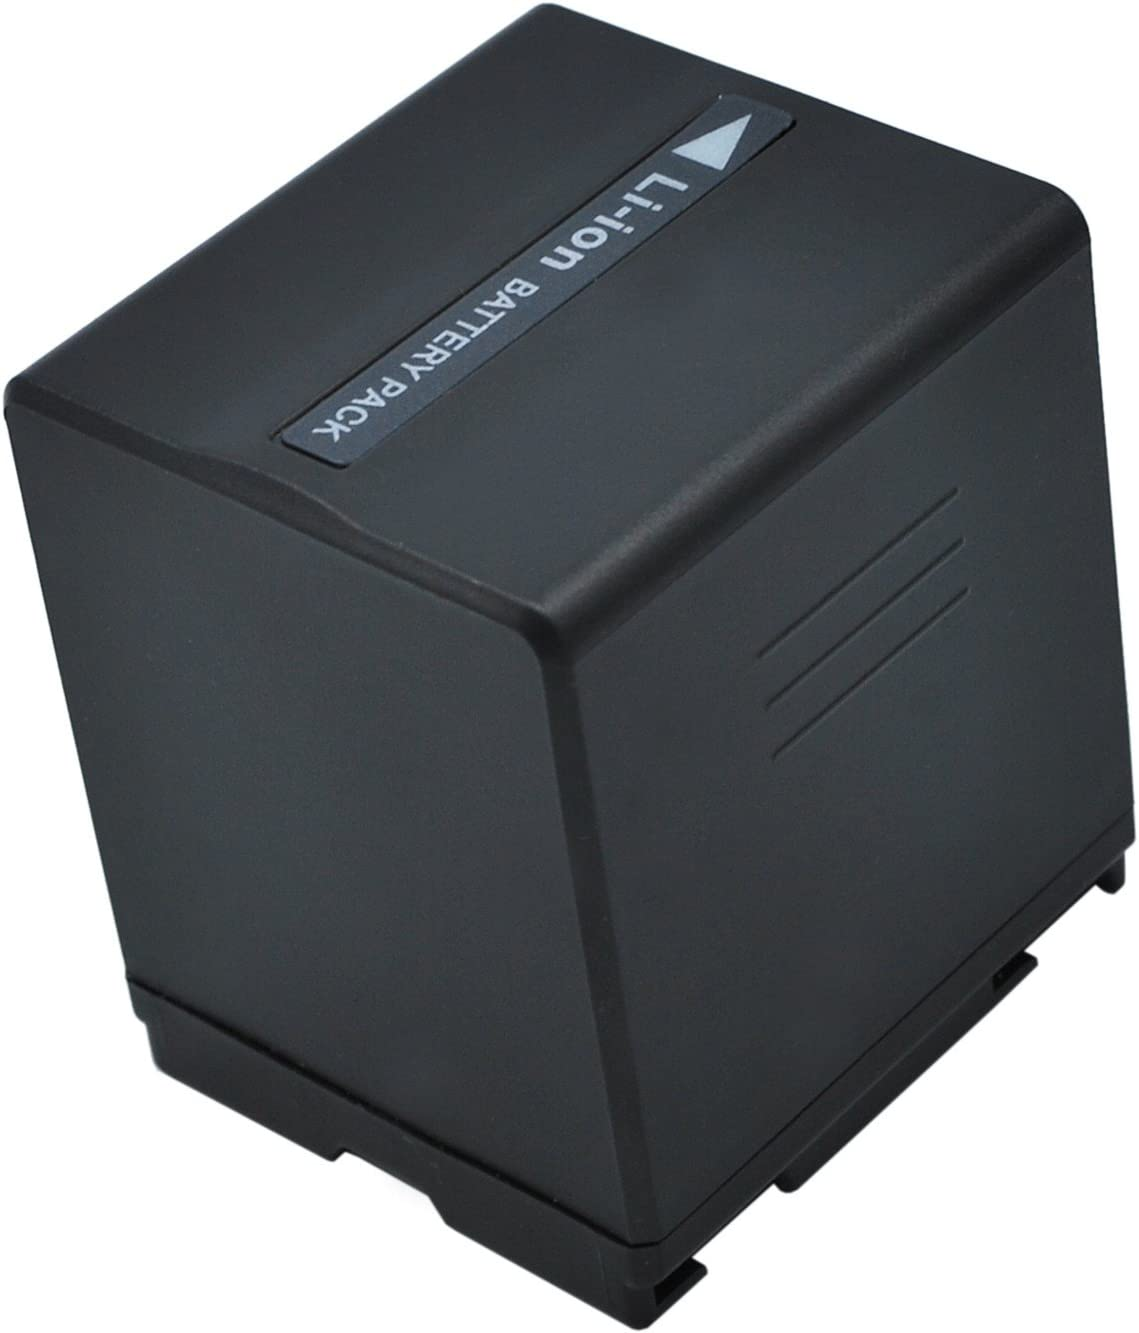 DZ-GX20 DZ-GX3300 DZ-GX20A DZ-GX3300 DZ-GX3300A DZ-GX3200E DZ-GX3200 DZ-BD7H B Cameron-Sino CS Spare Battery for Hitachi Camera DZ-BD70 DZ-GX3300E S DZ-GX20E DZ-GX3200A DZ-BX37E DZ